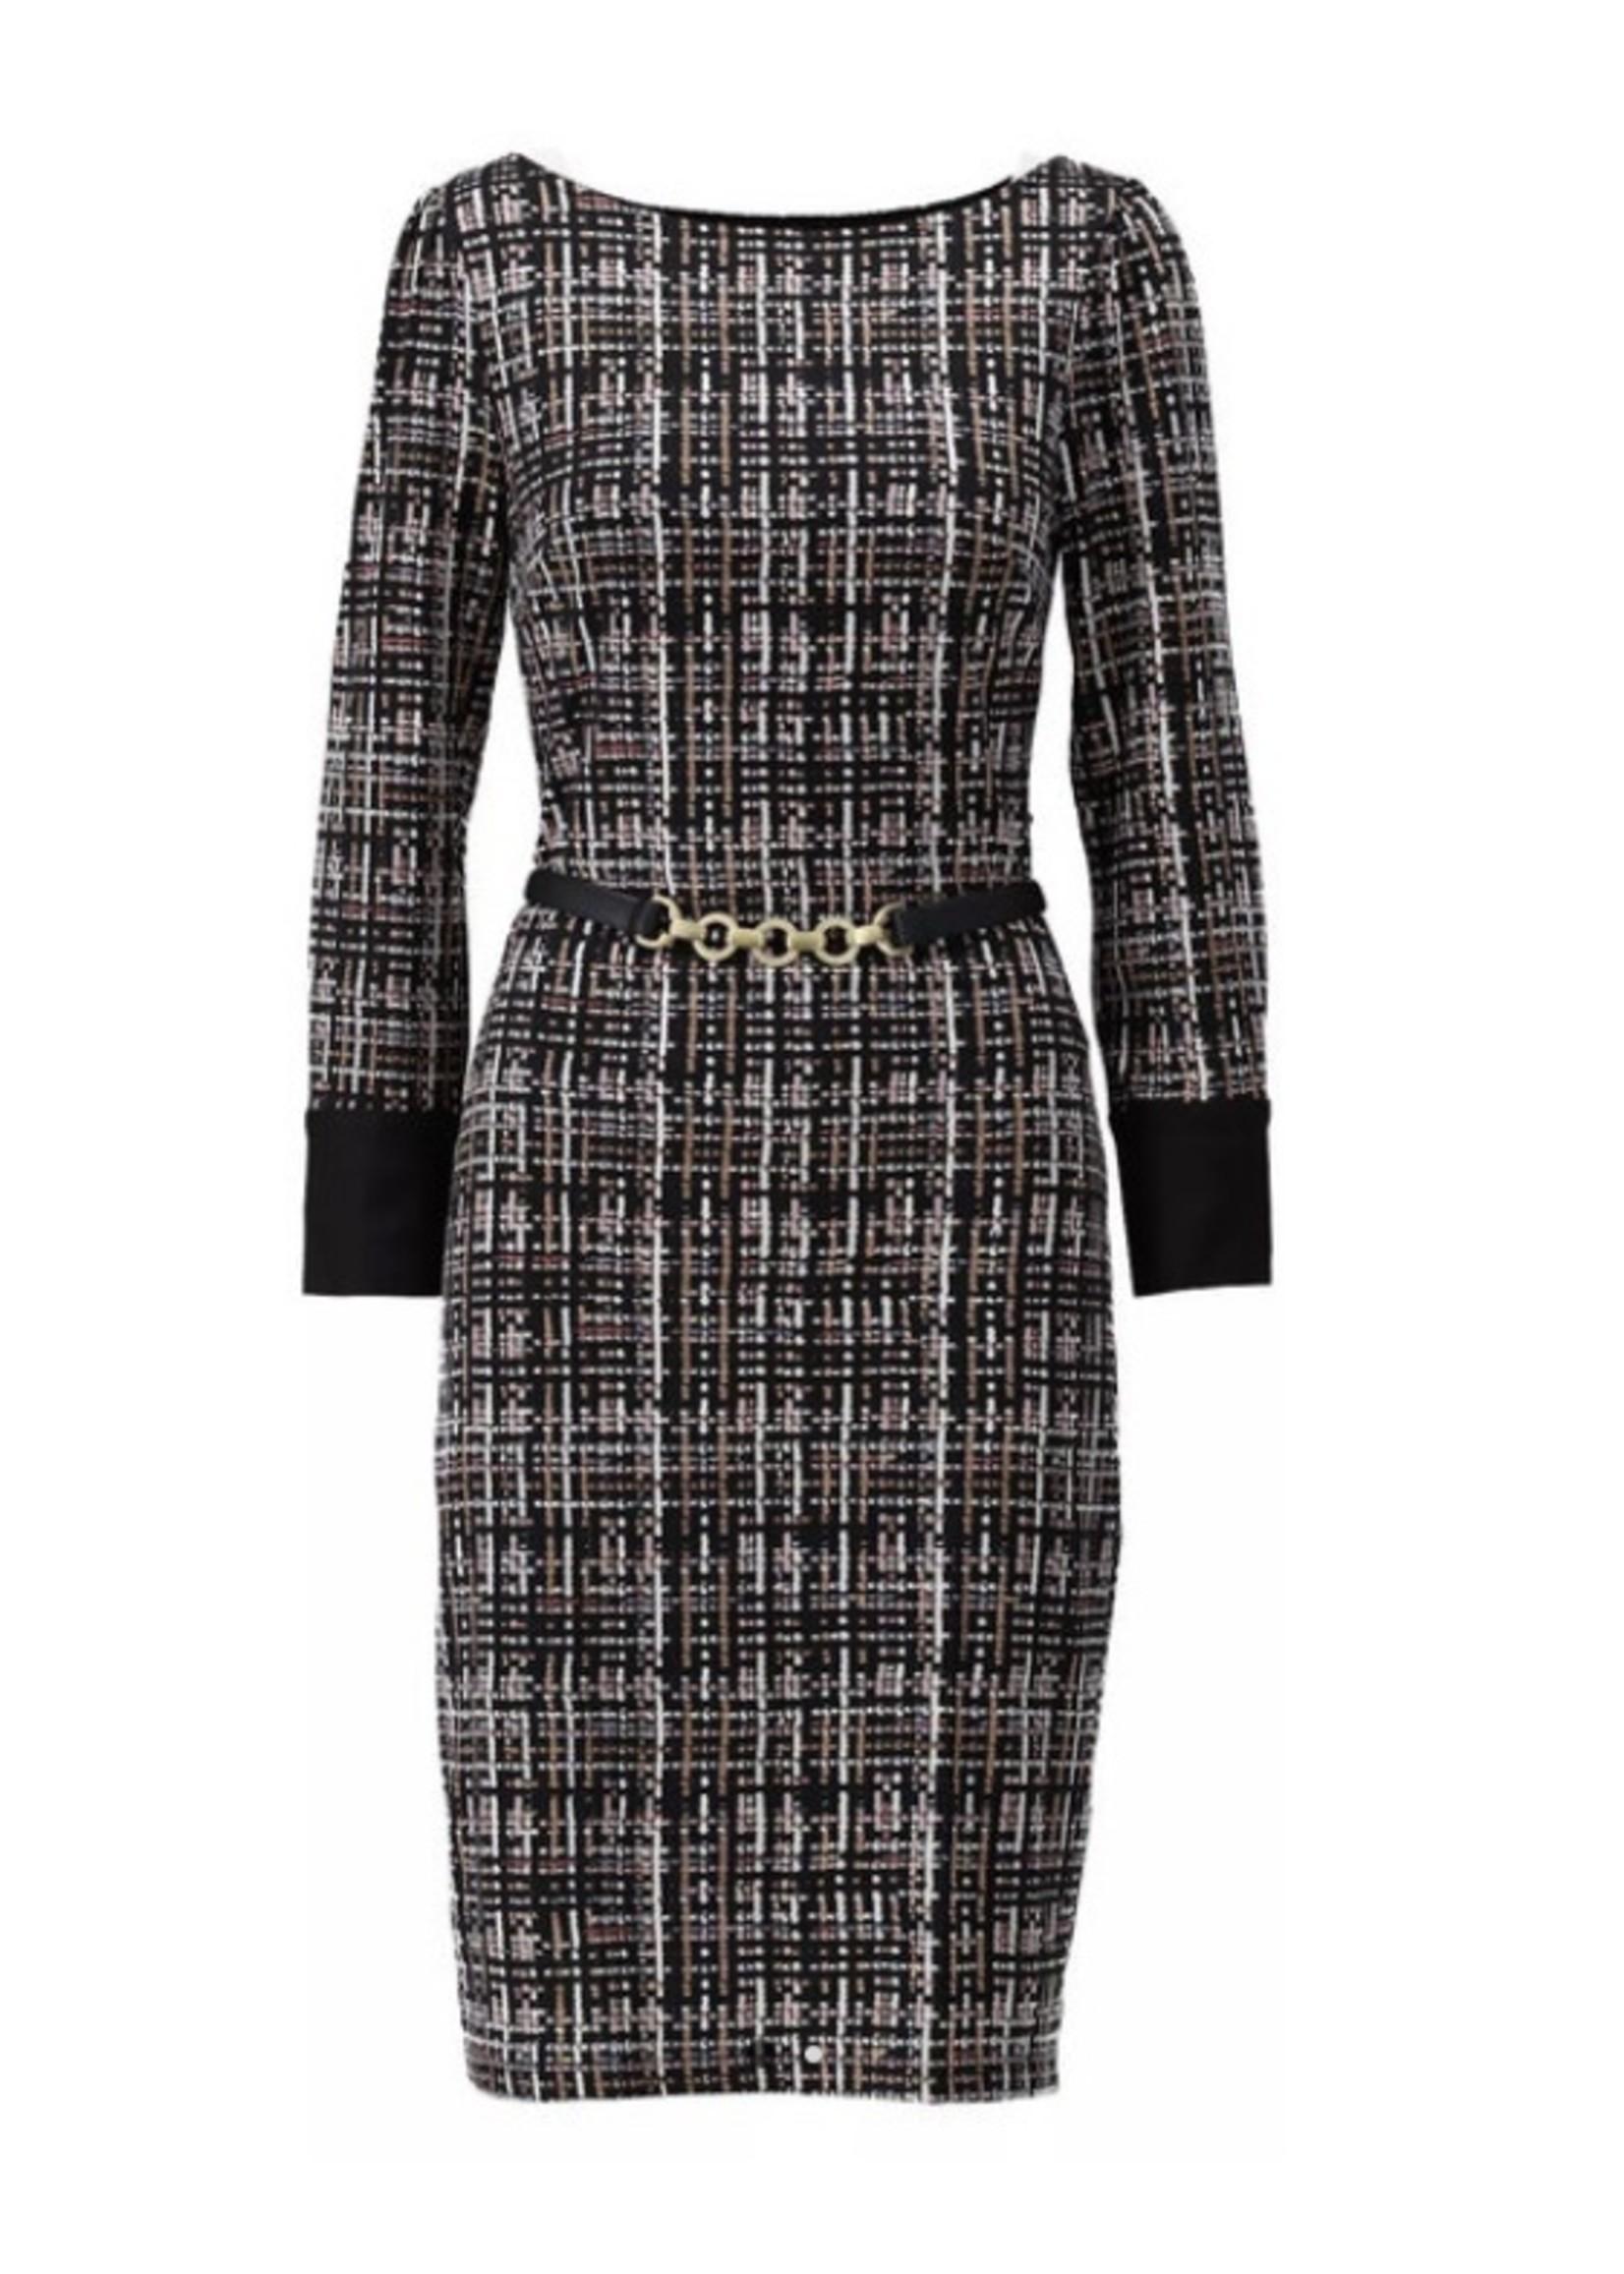 K-design K-Design - T822 jurk - print jurk met riem